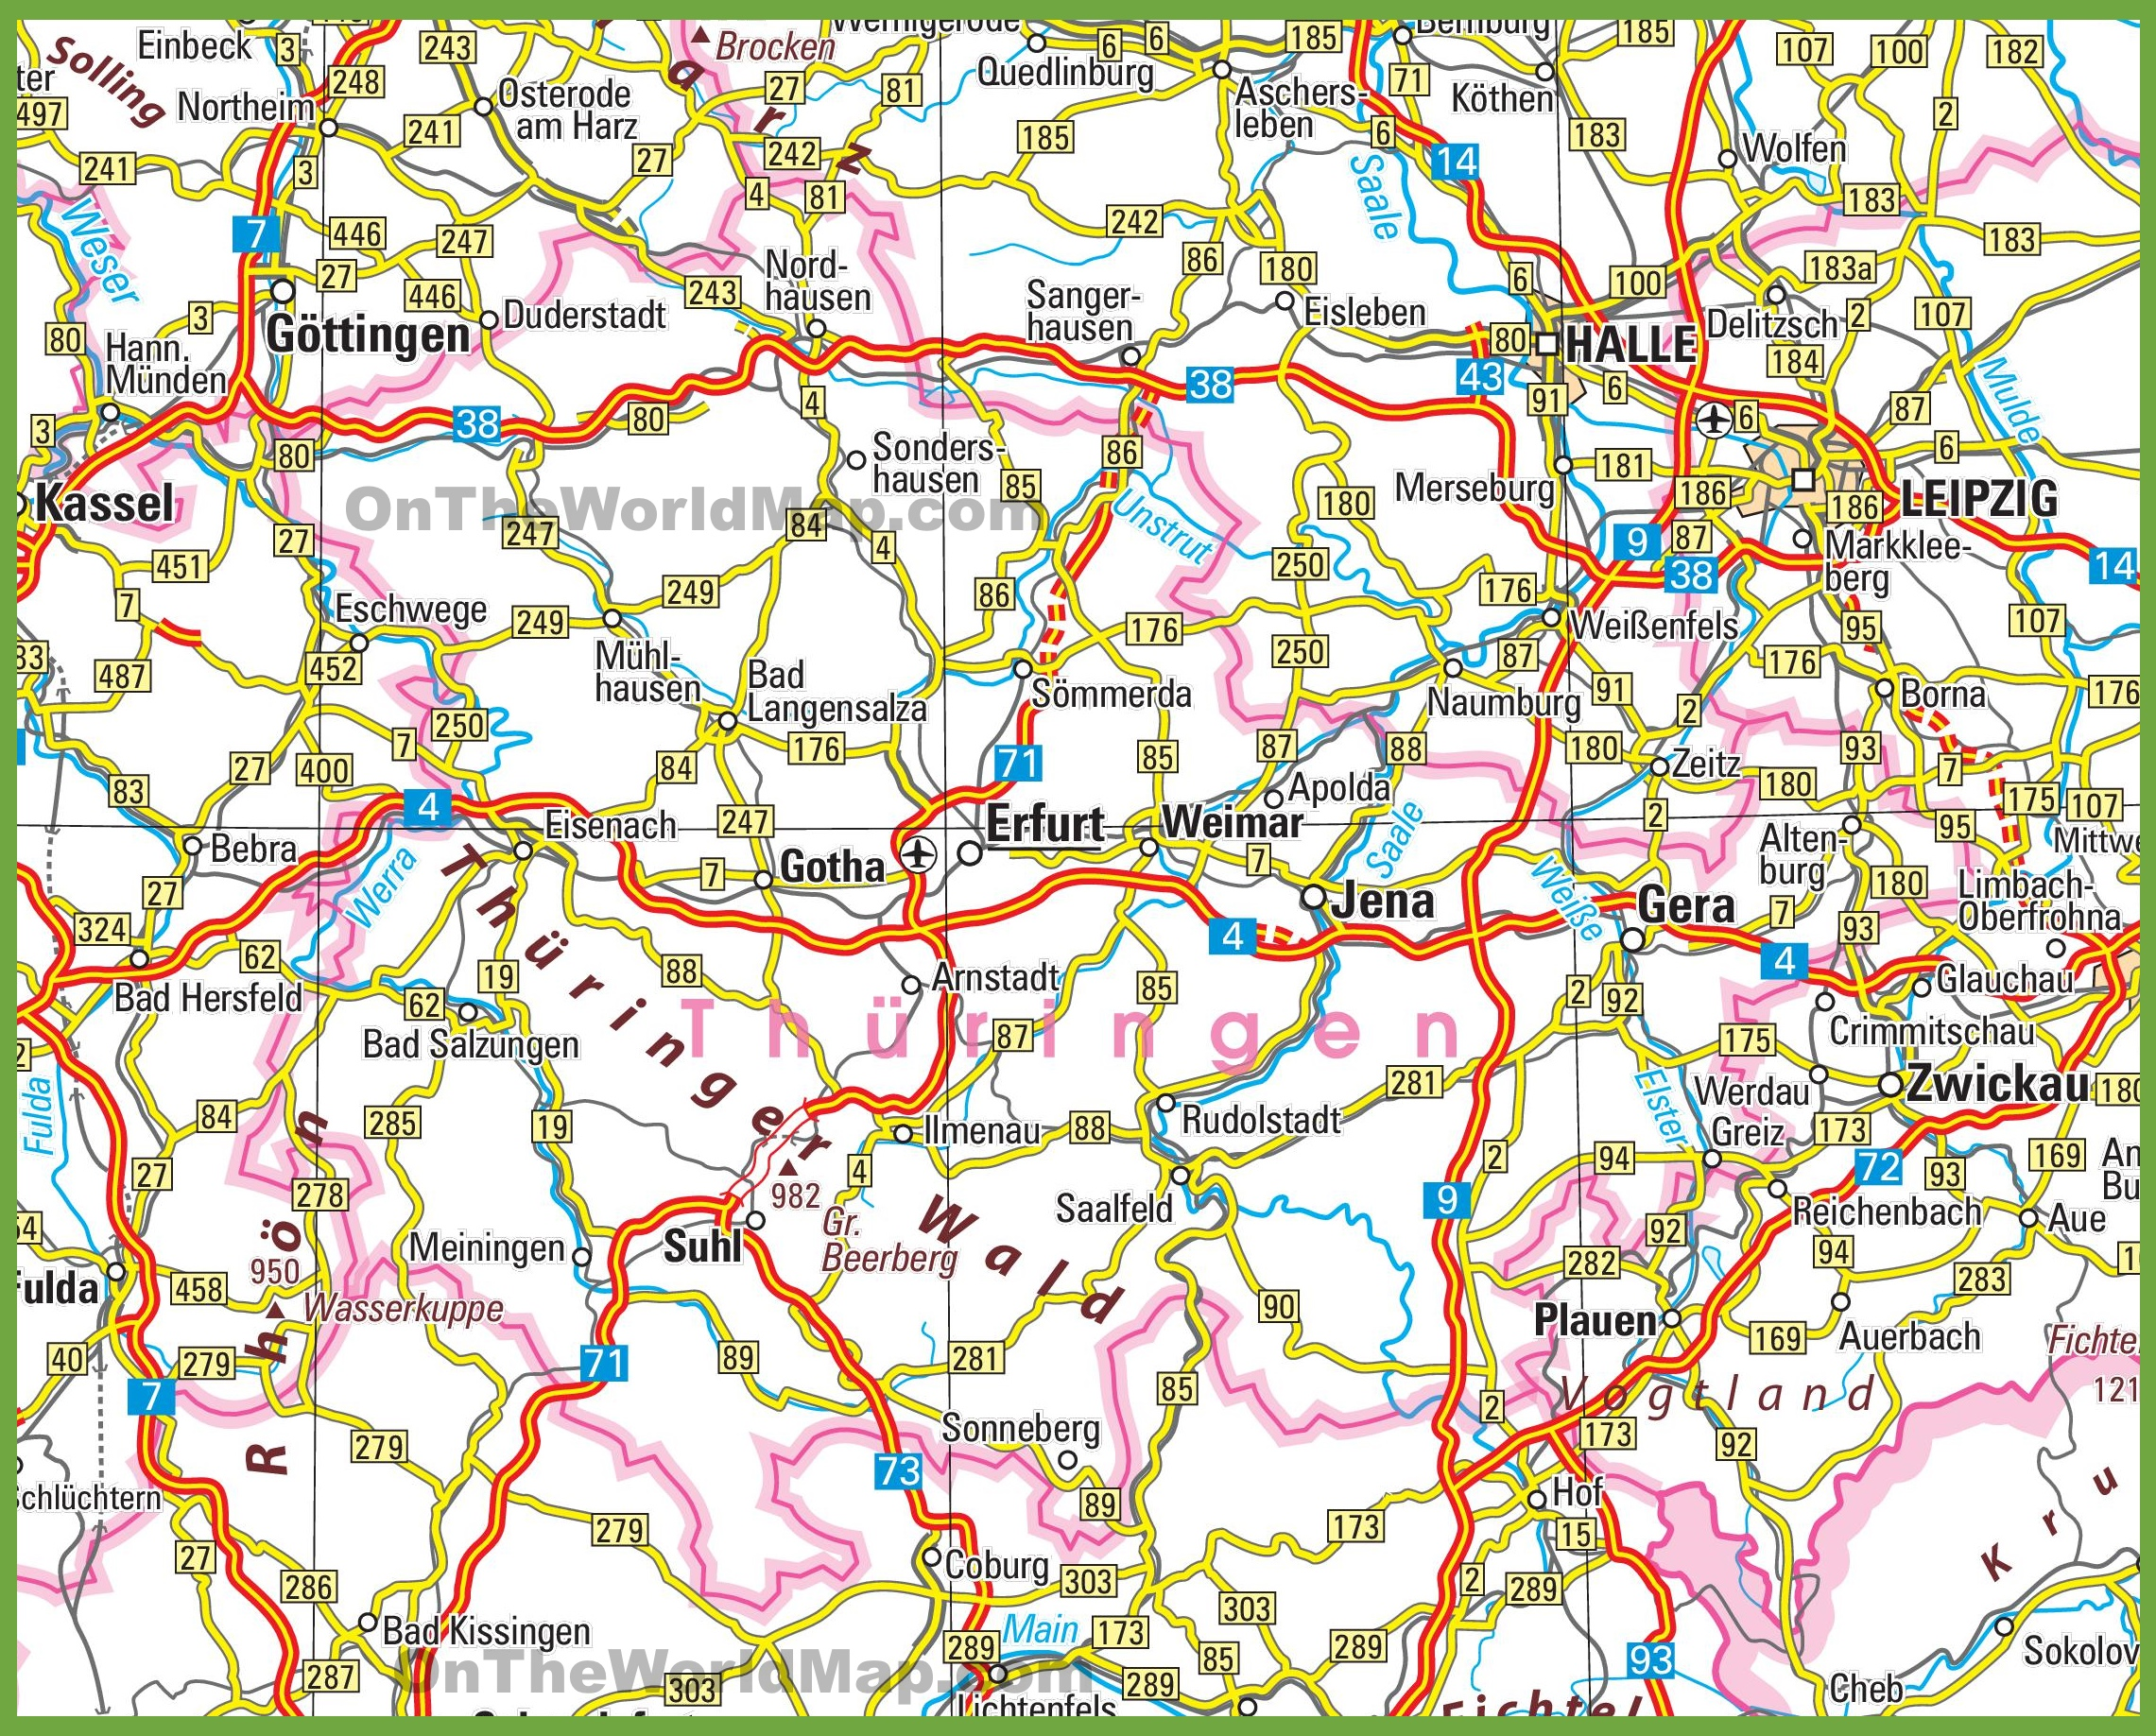 Thuringia road map